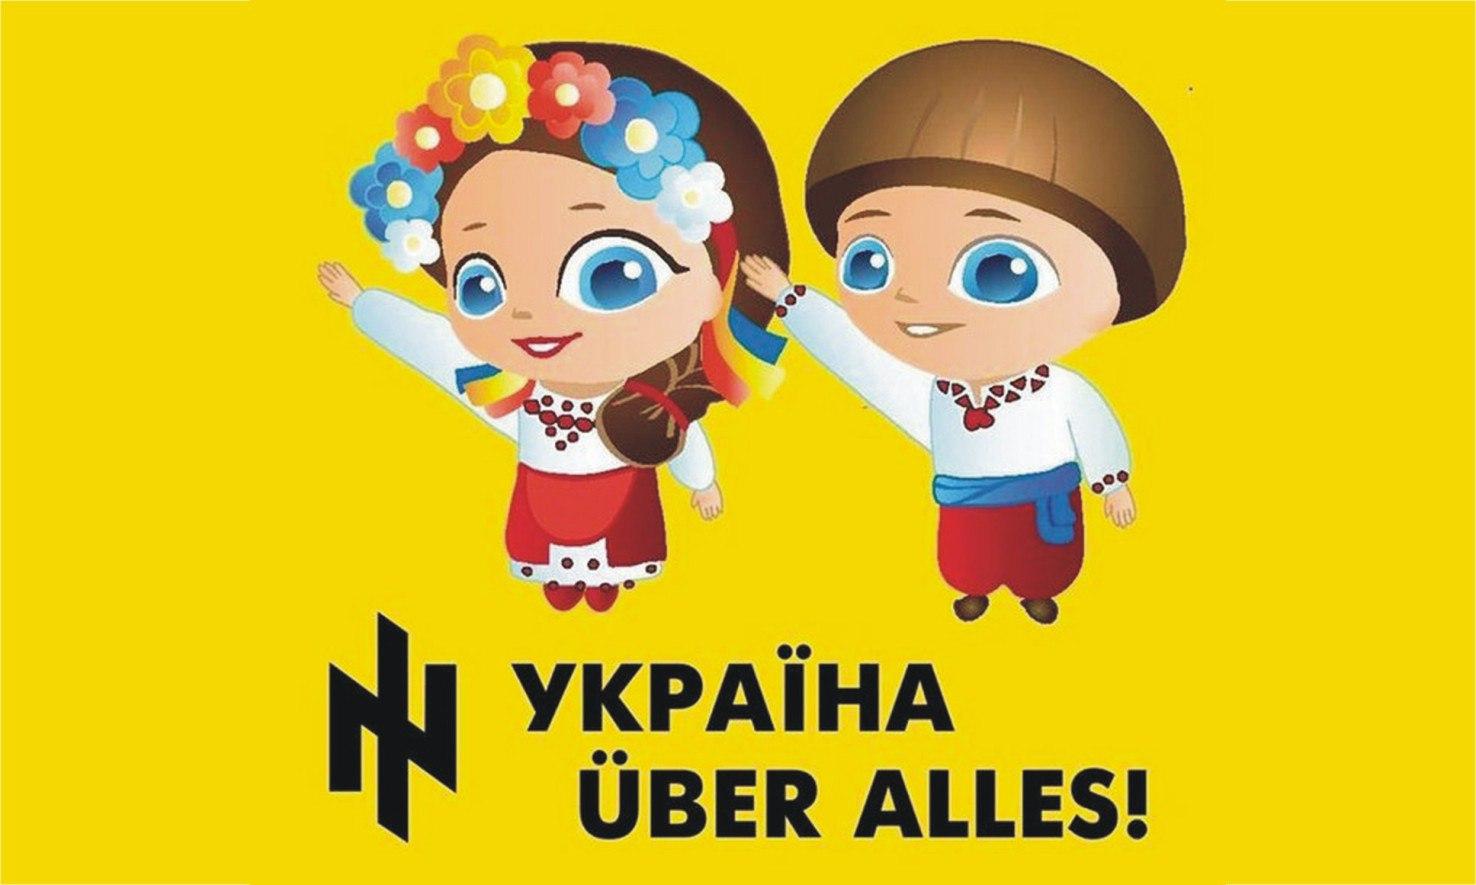 Украина über alles!